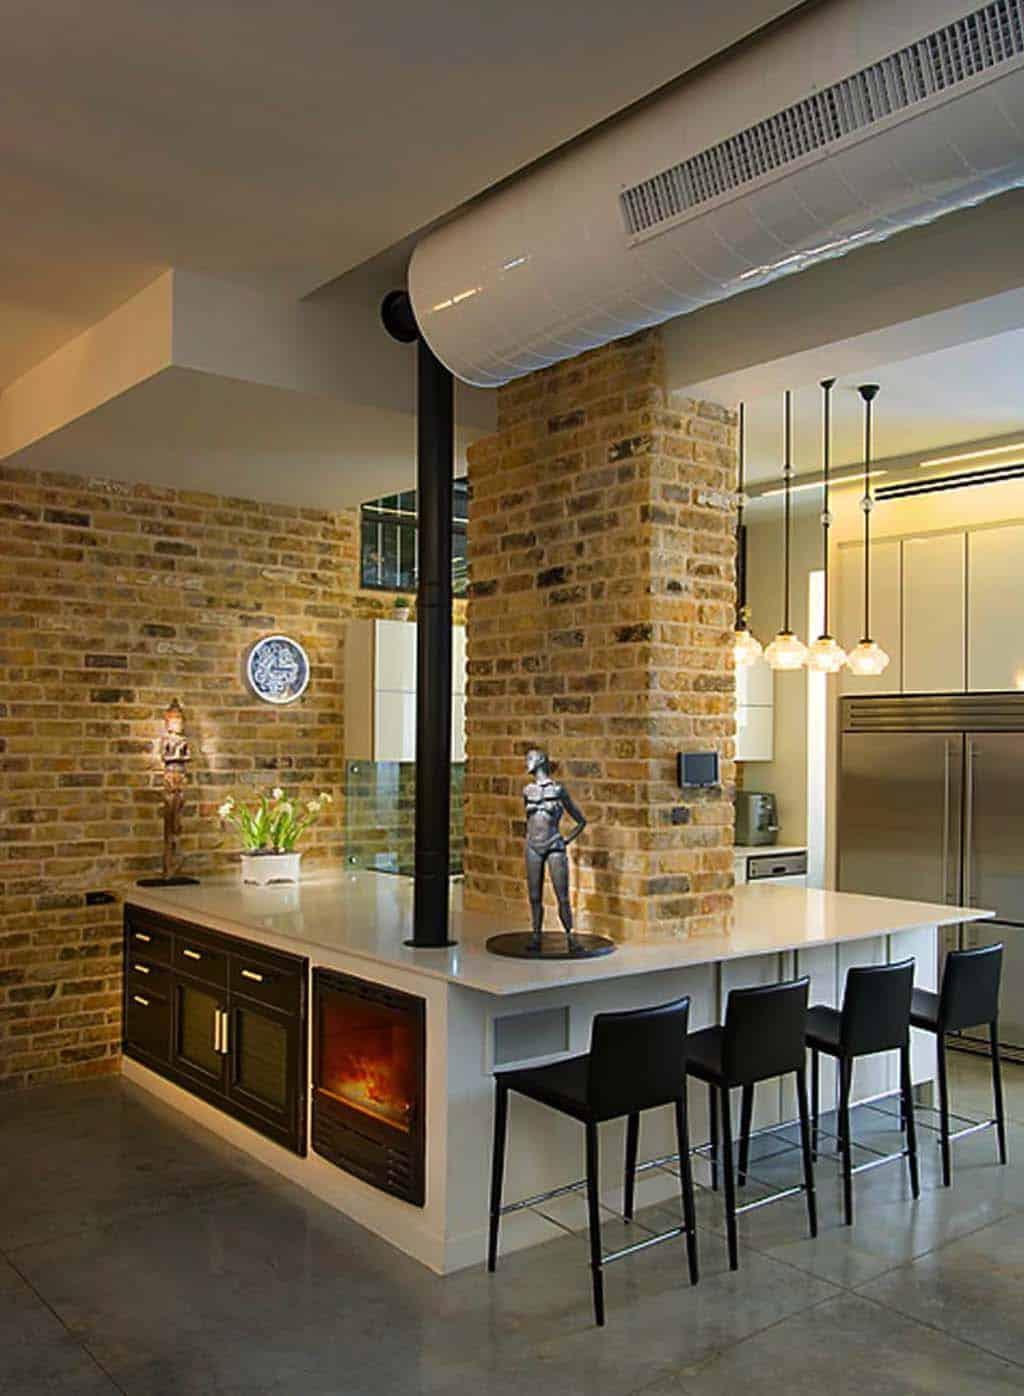 Kitchen Showcasing Cozy Fireplace-25-1 Kindesign